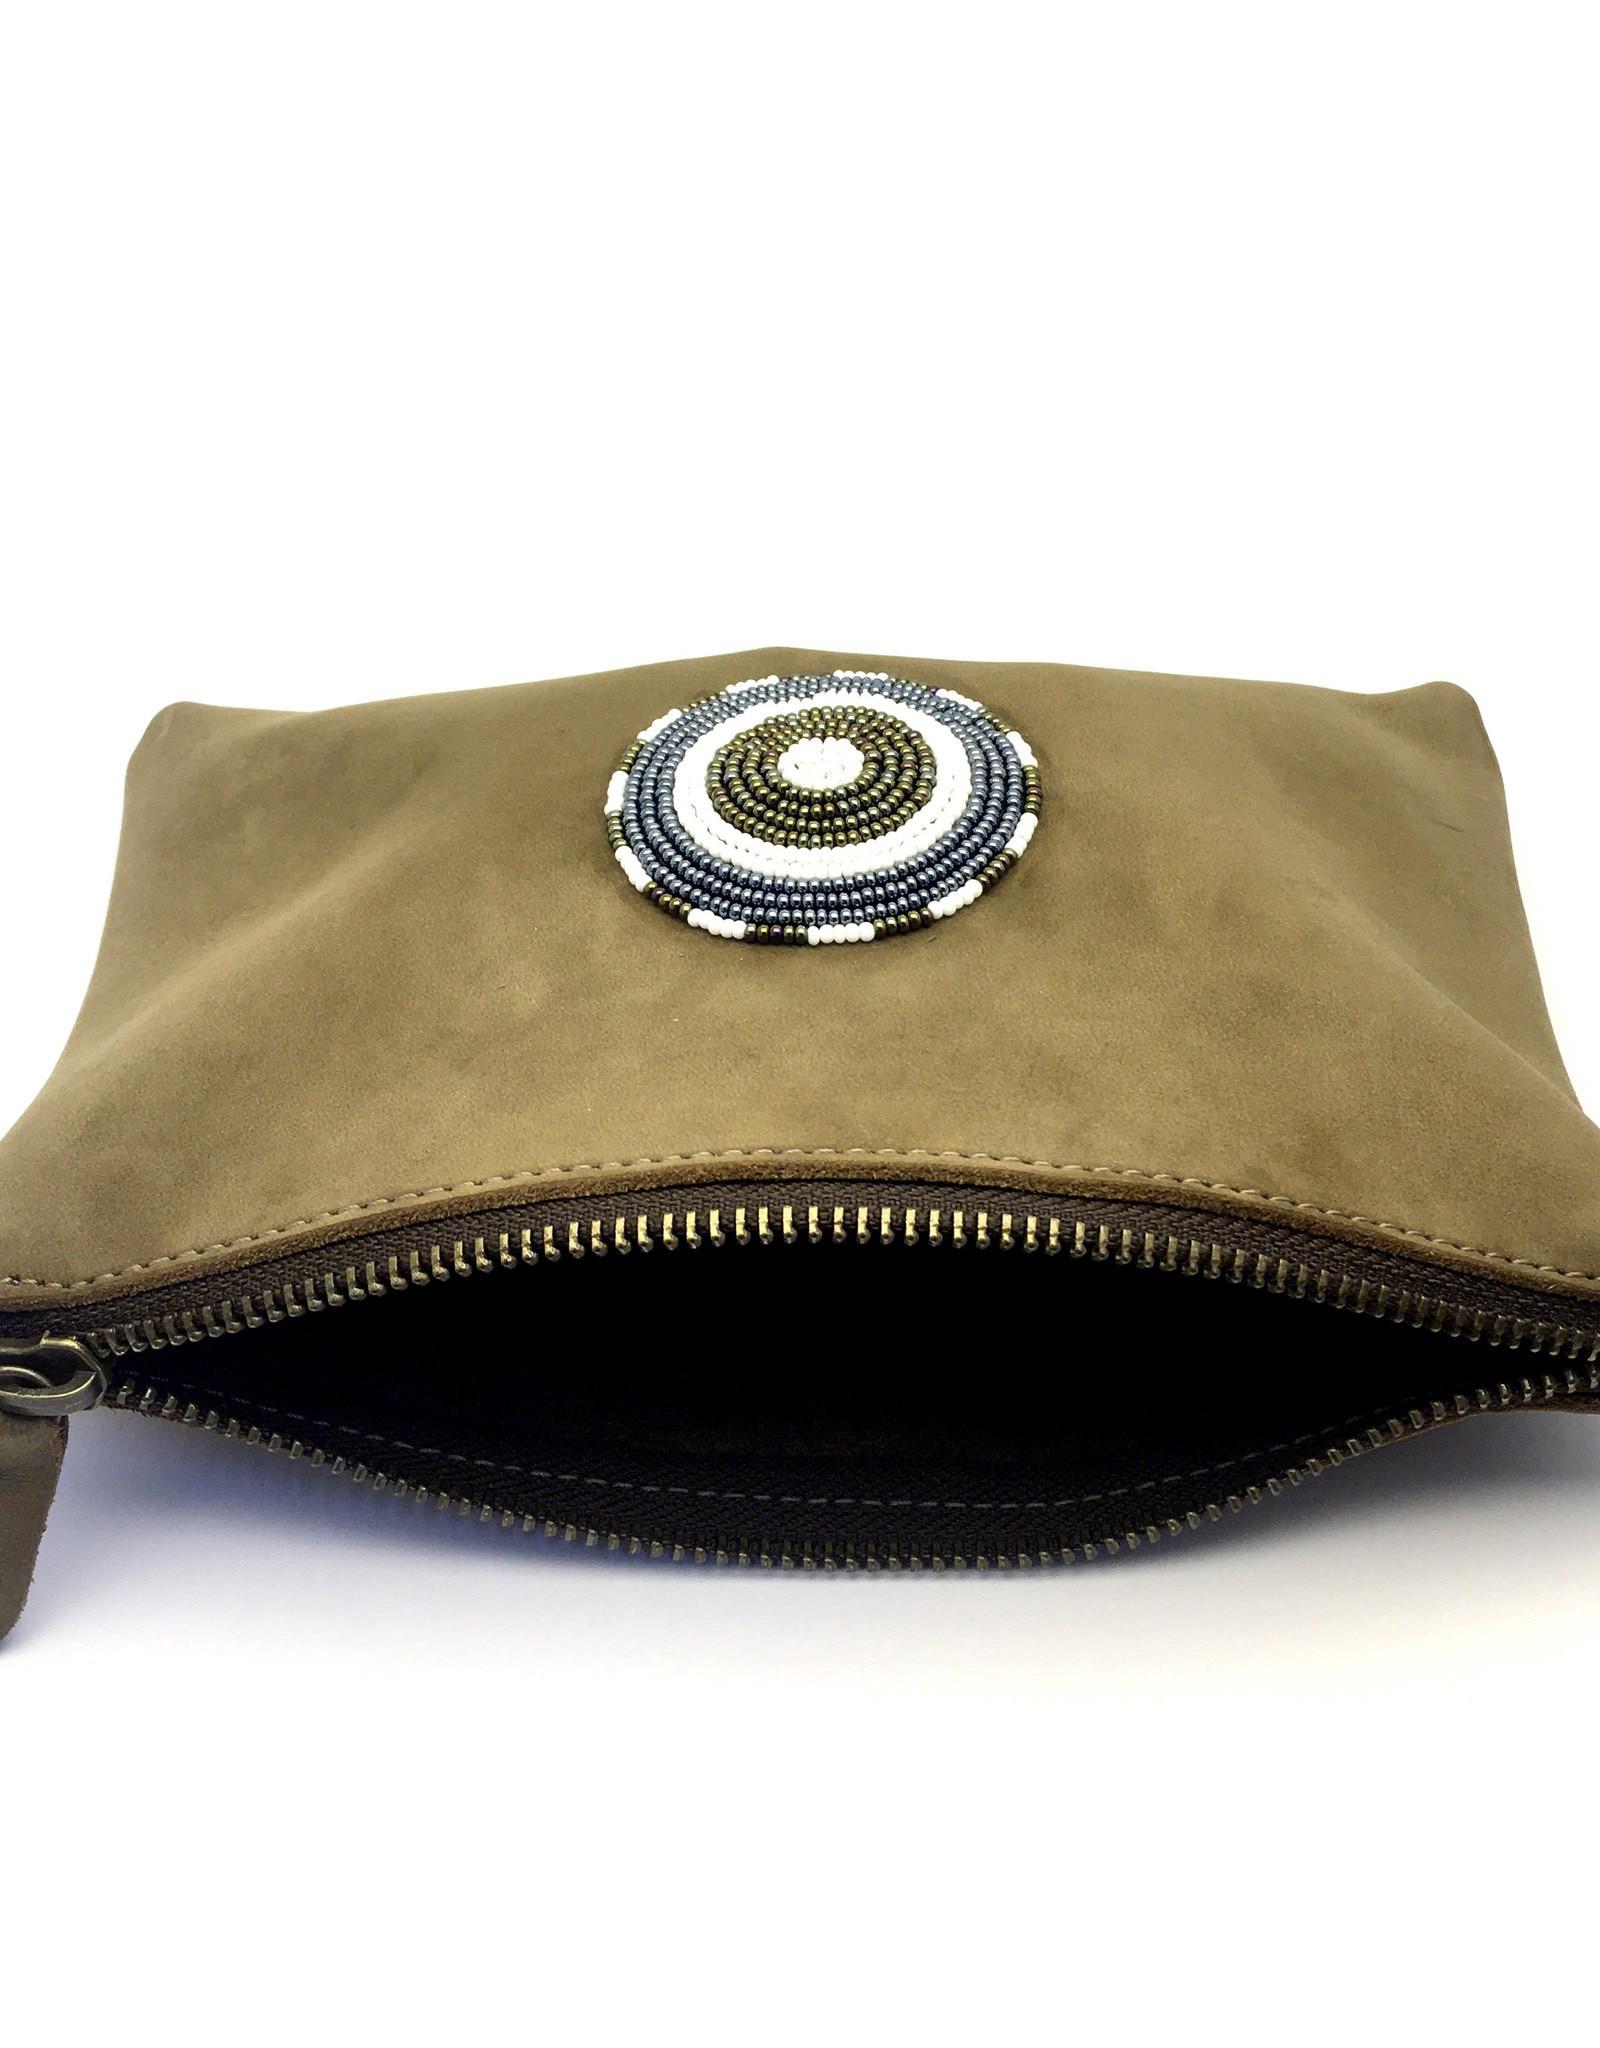 Maisha.Style Maisha purse - tan suede leather purse with tone on tone beads